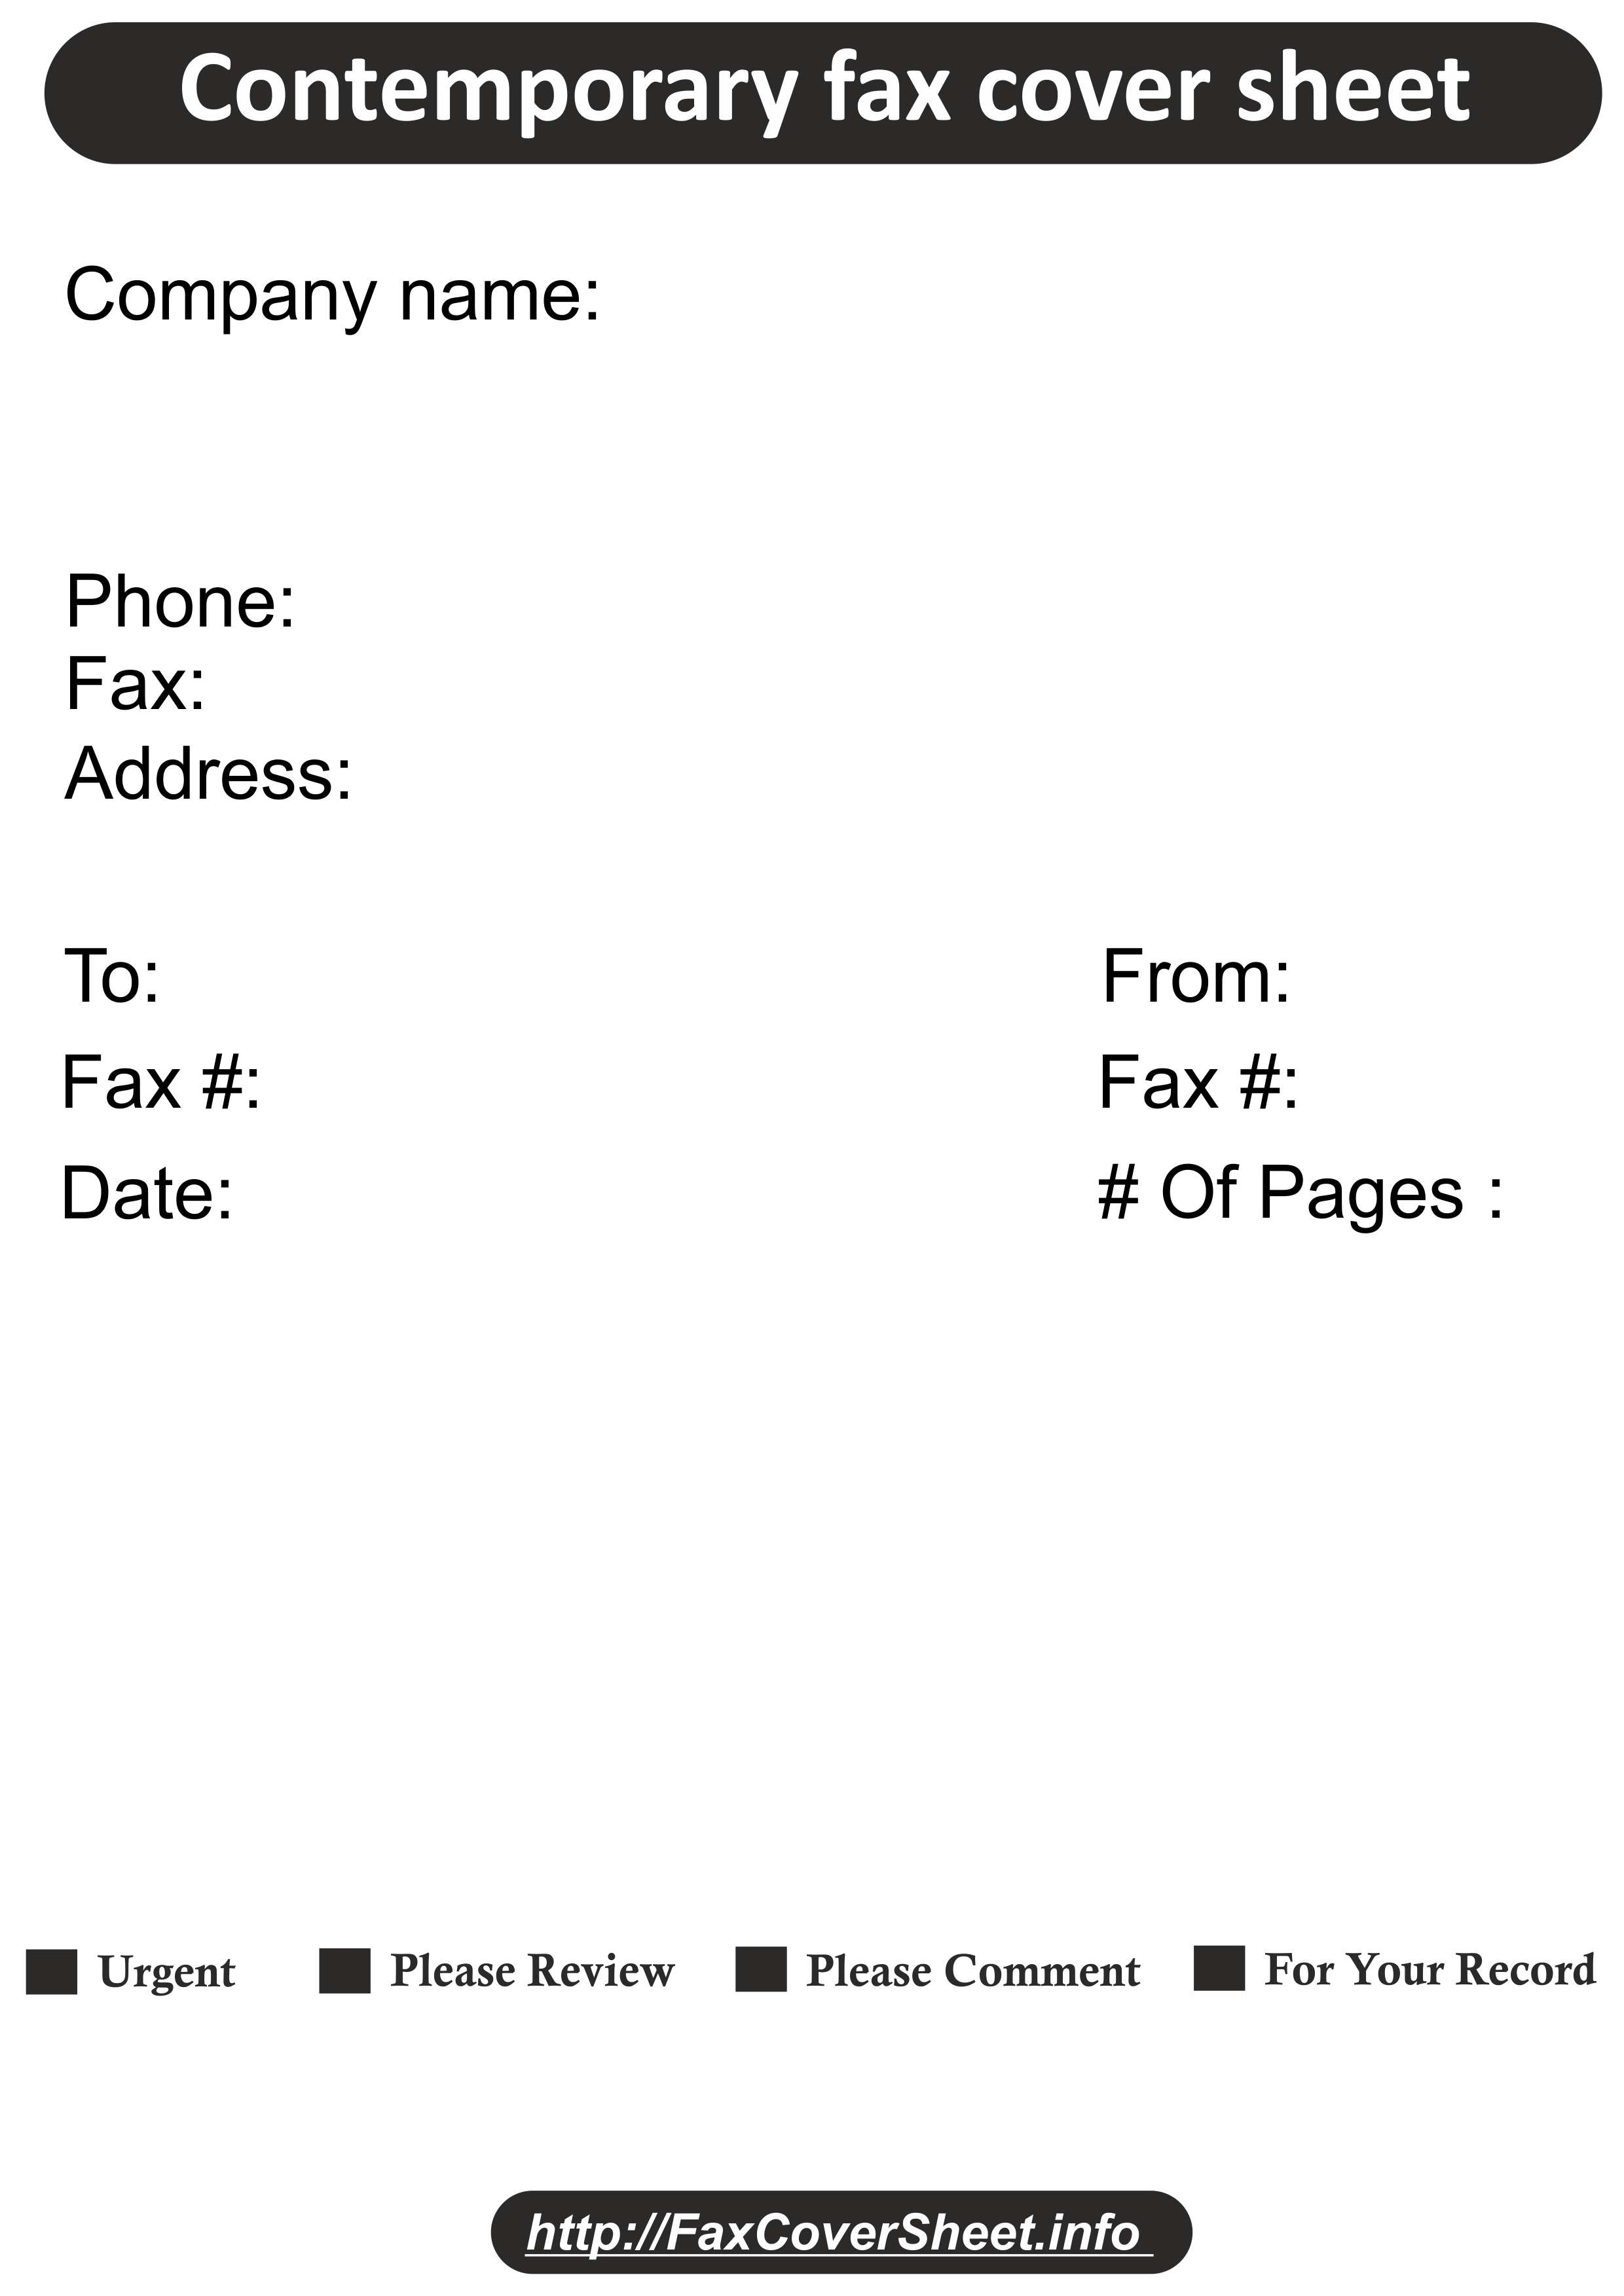 Contemporary Design Fax Cover Sheet